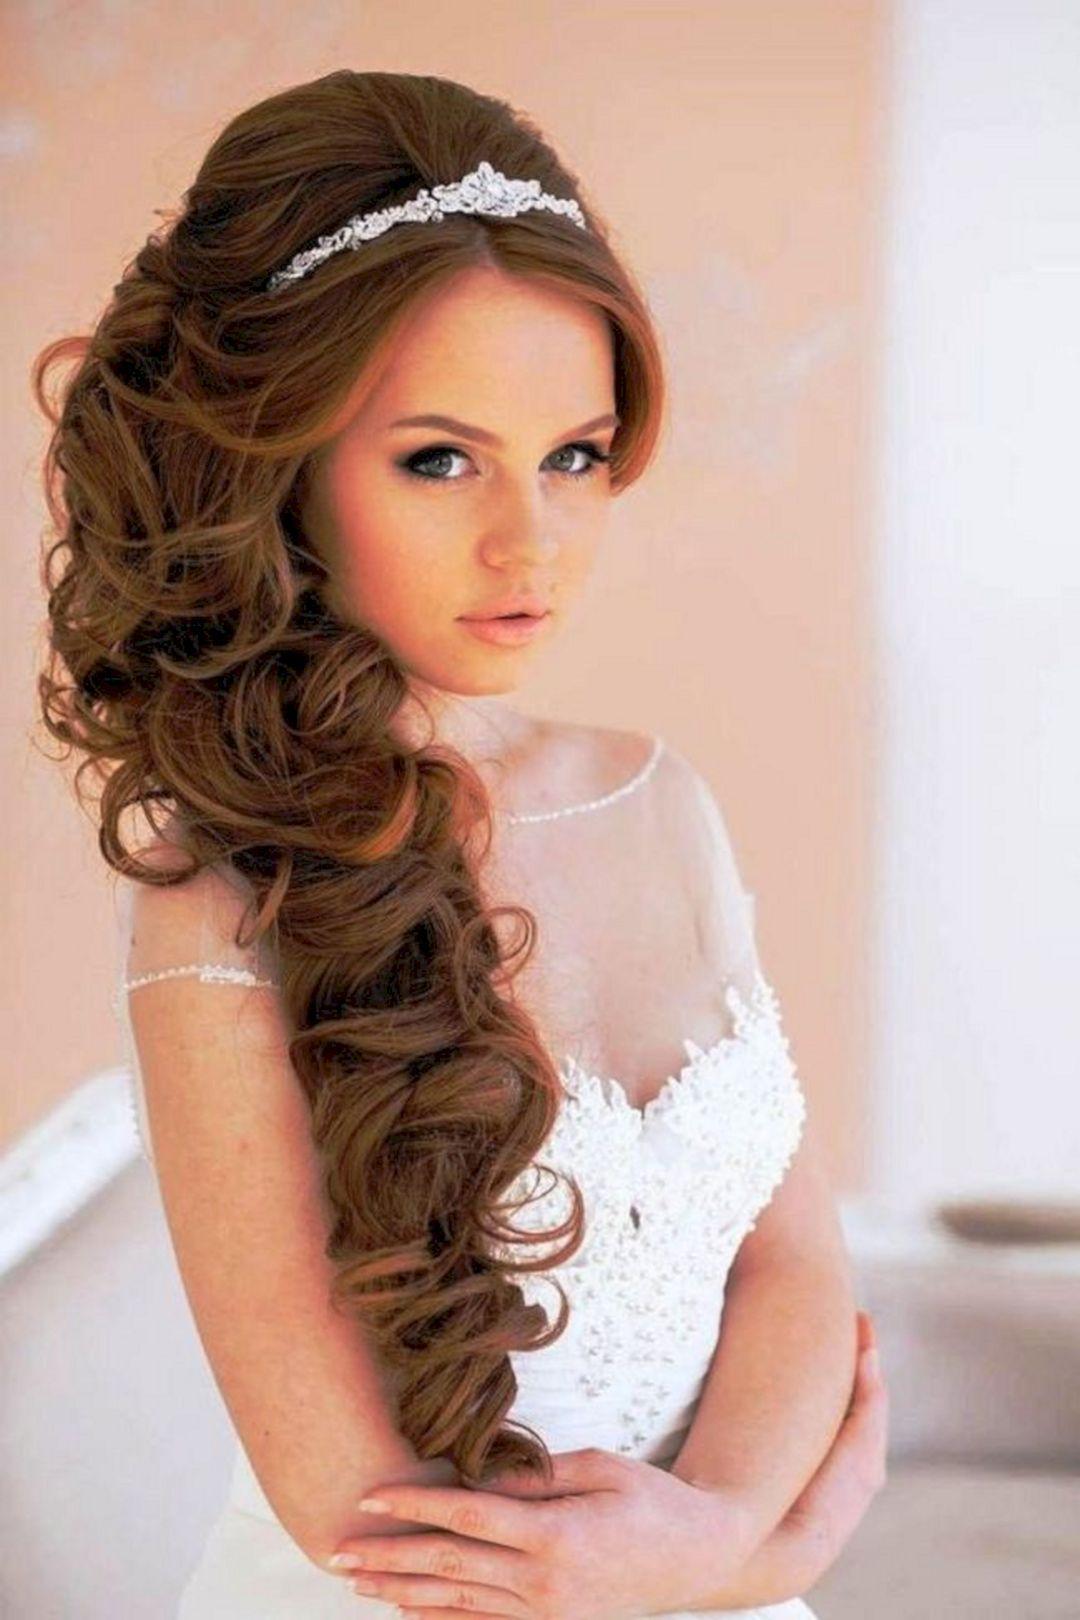 25 Beautiful Vintage Wedding Hairstyles Design With Veil Ideas